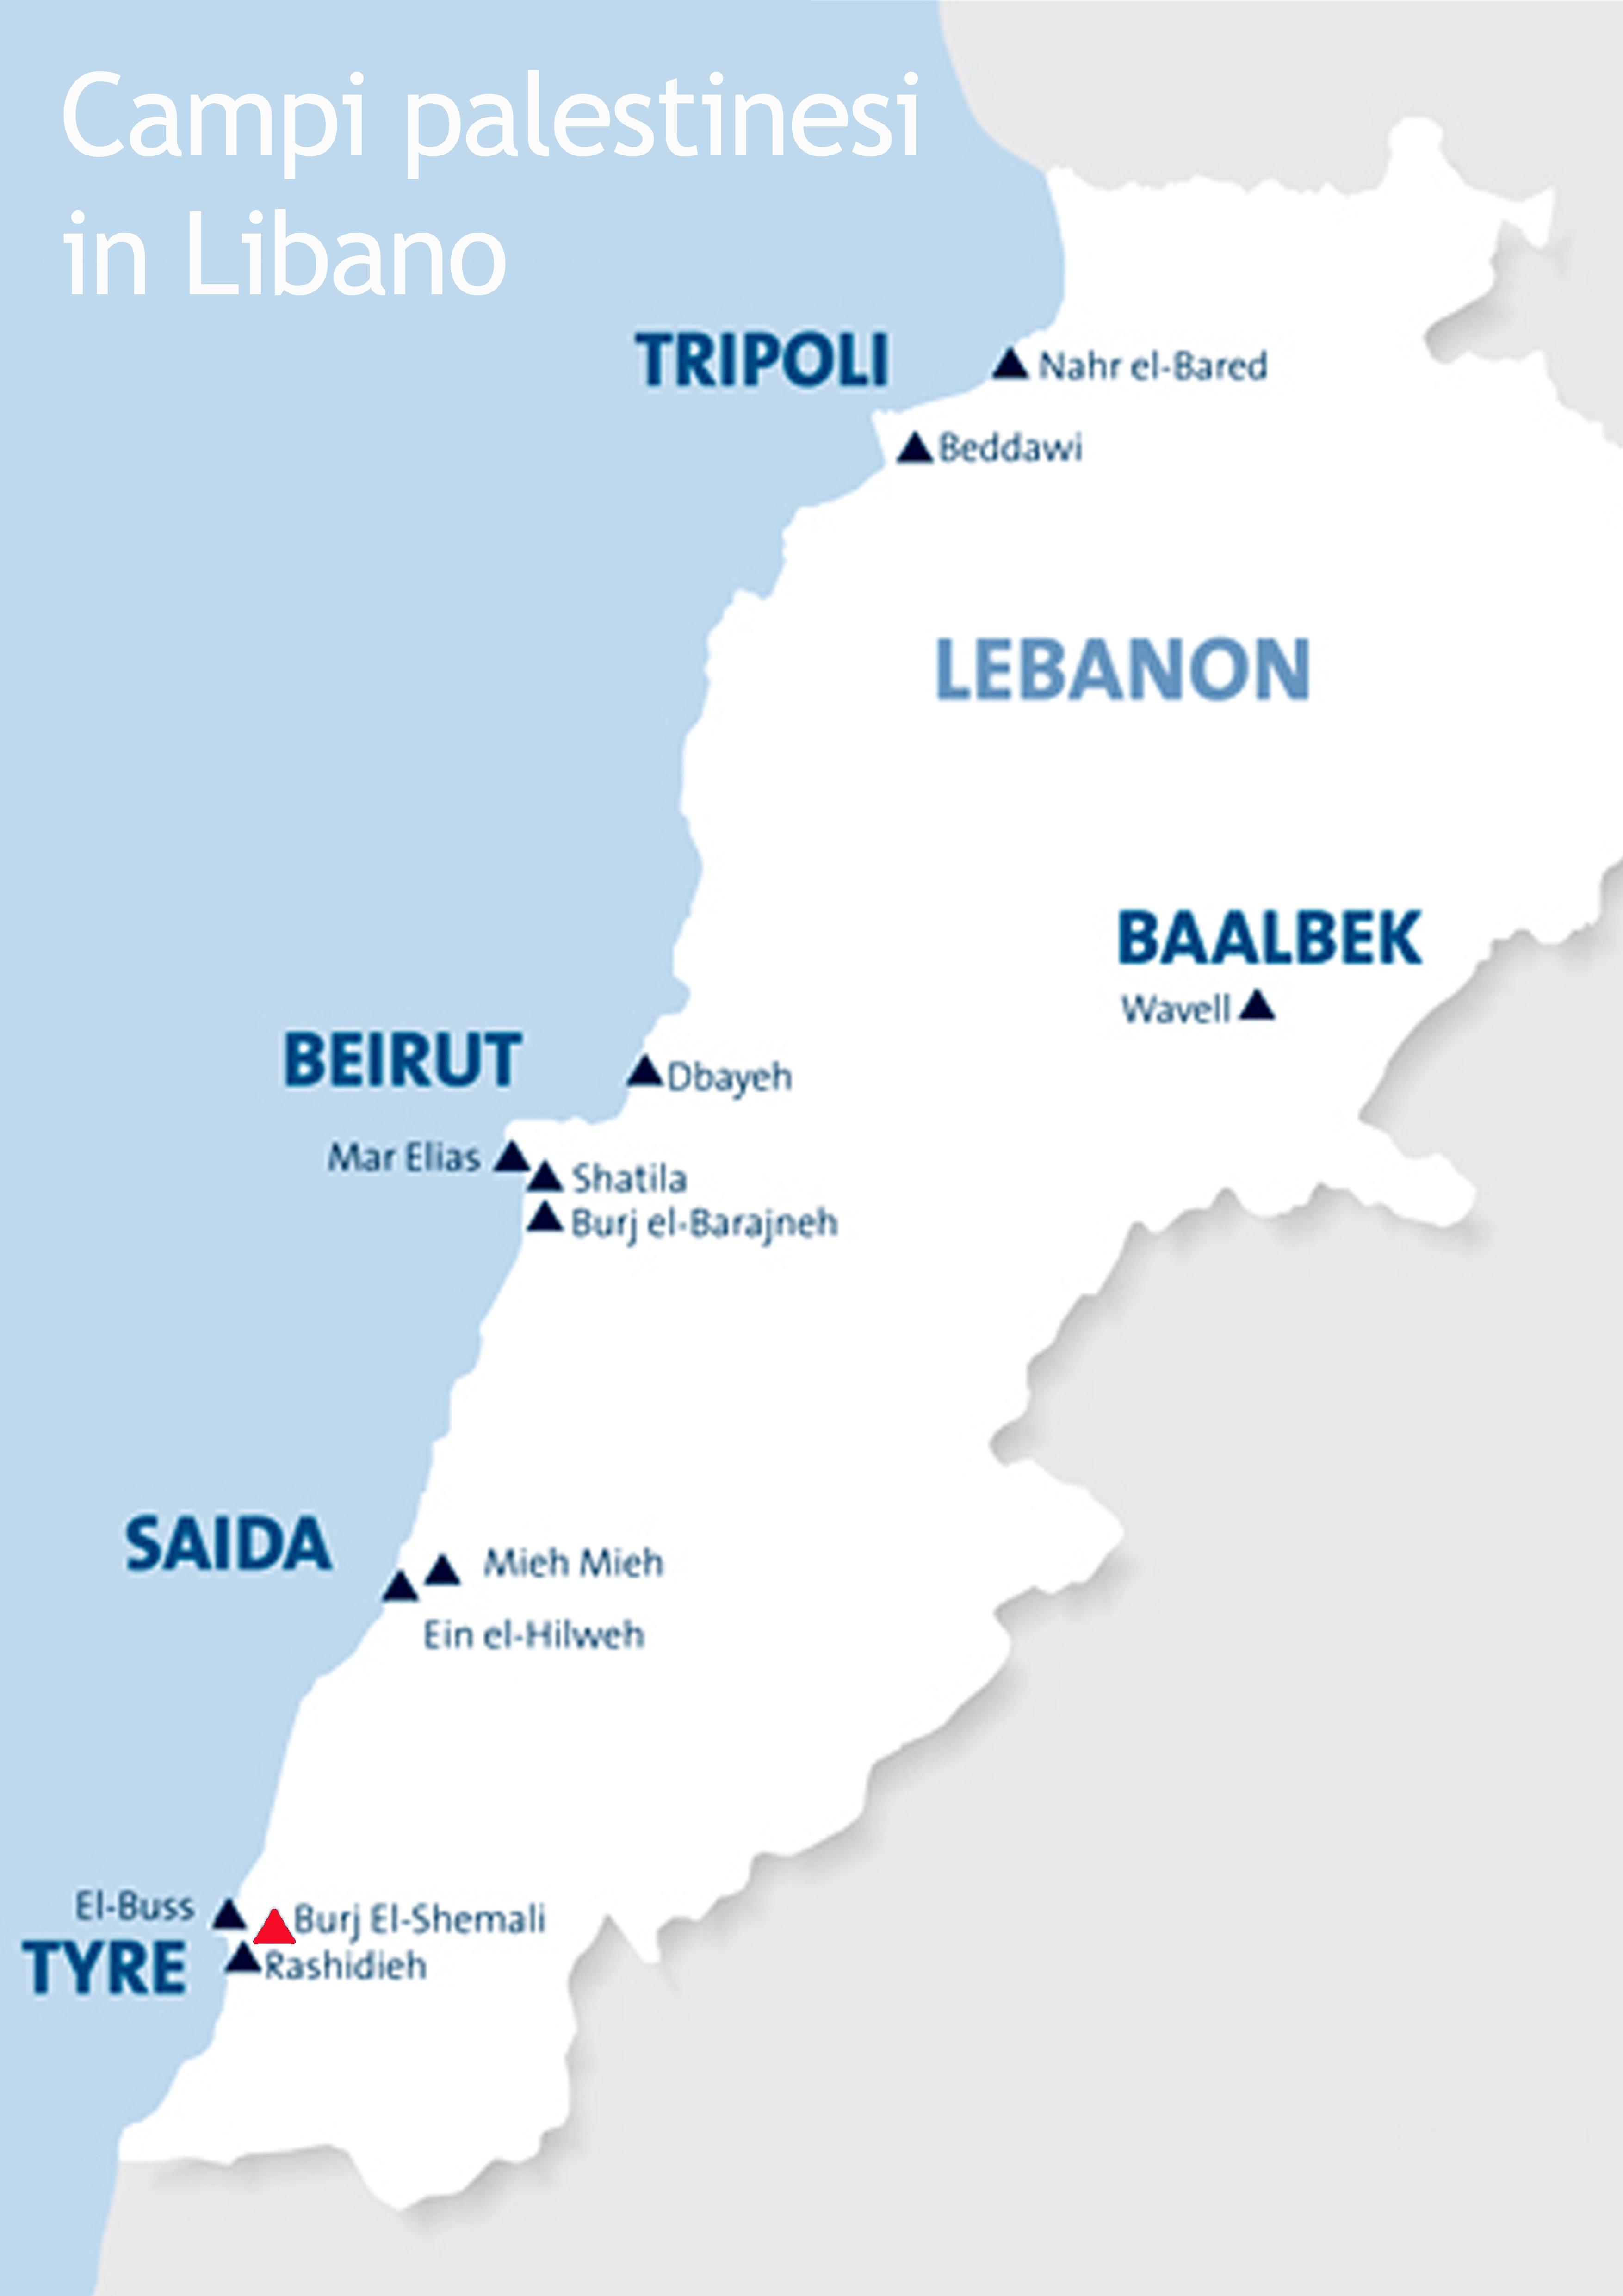 Cartina Del Libano.Mappa Del Libano E Campi